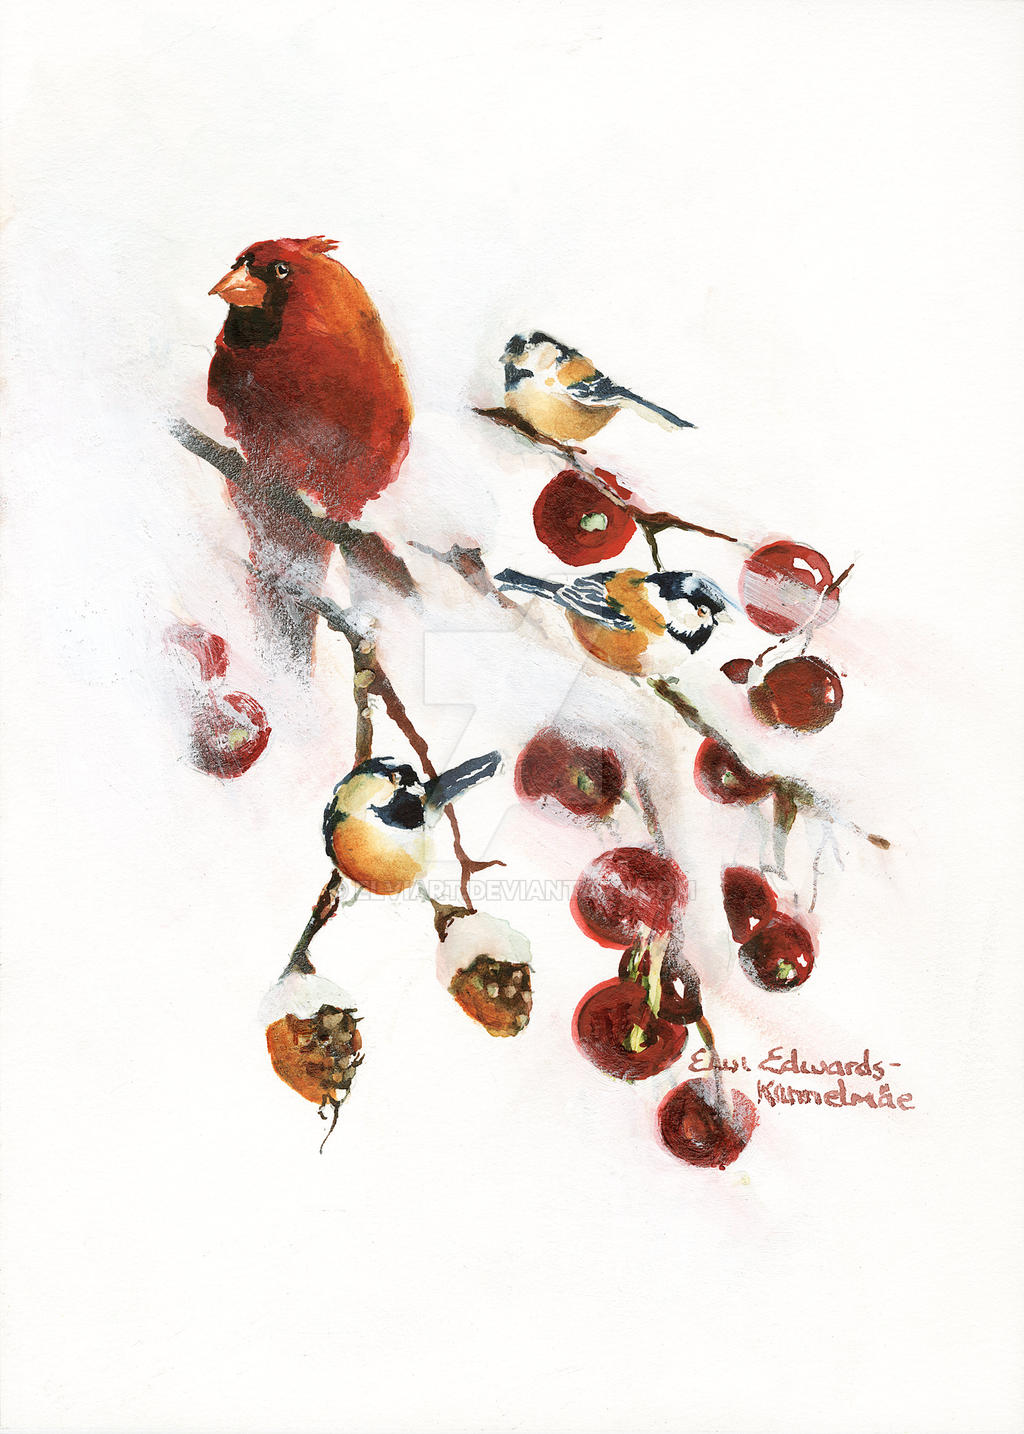 Winterland Birds by ElviArt